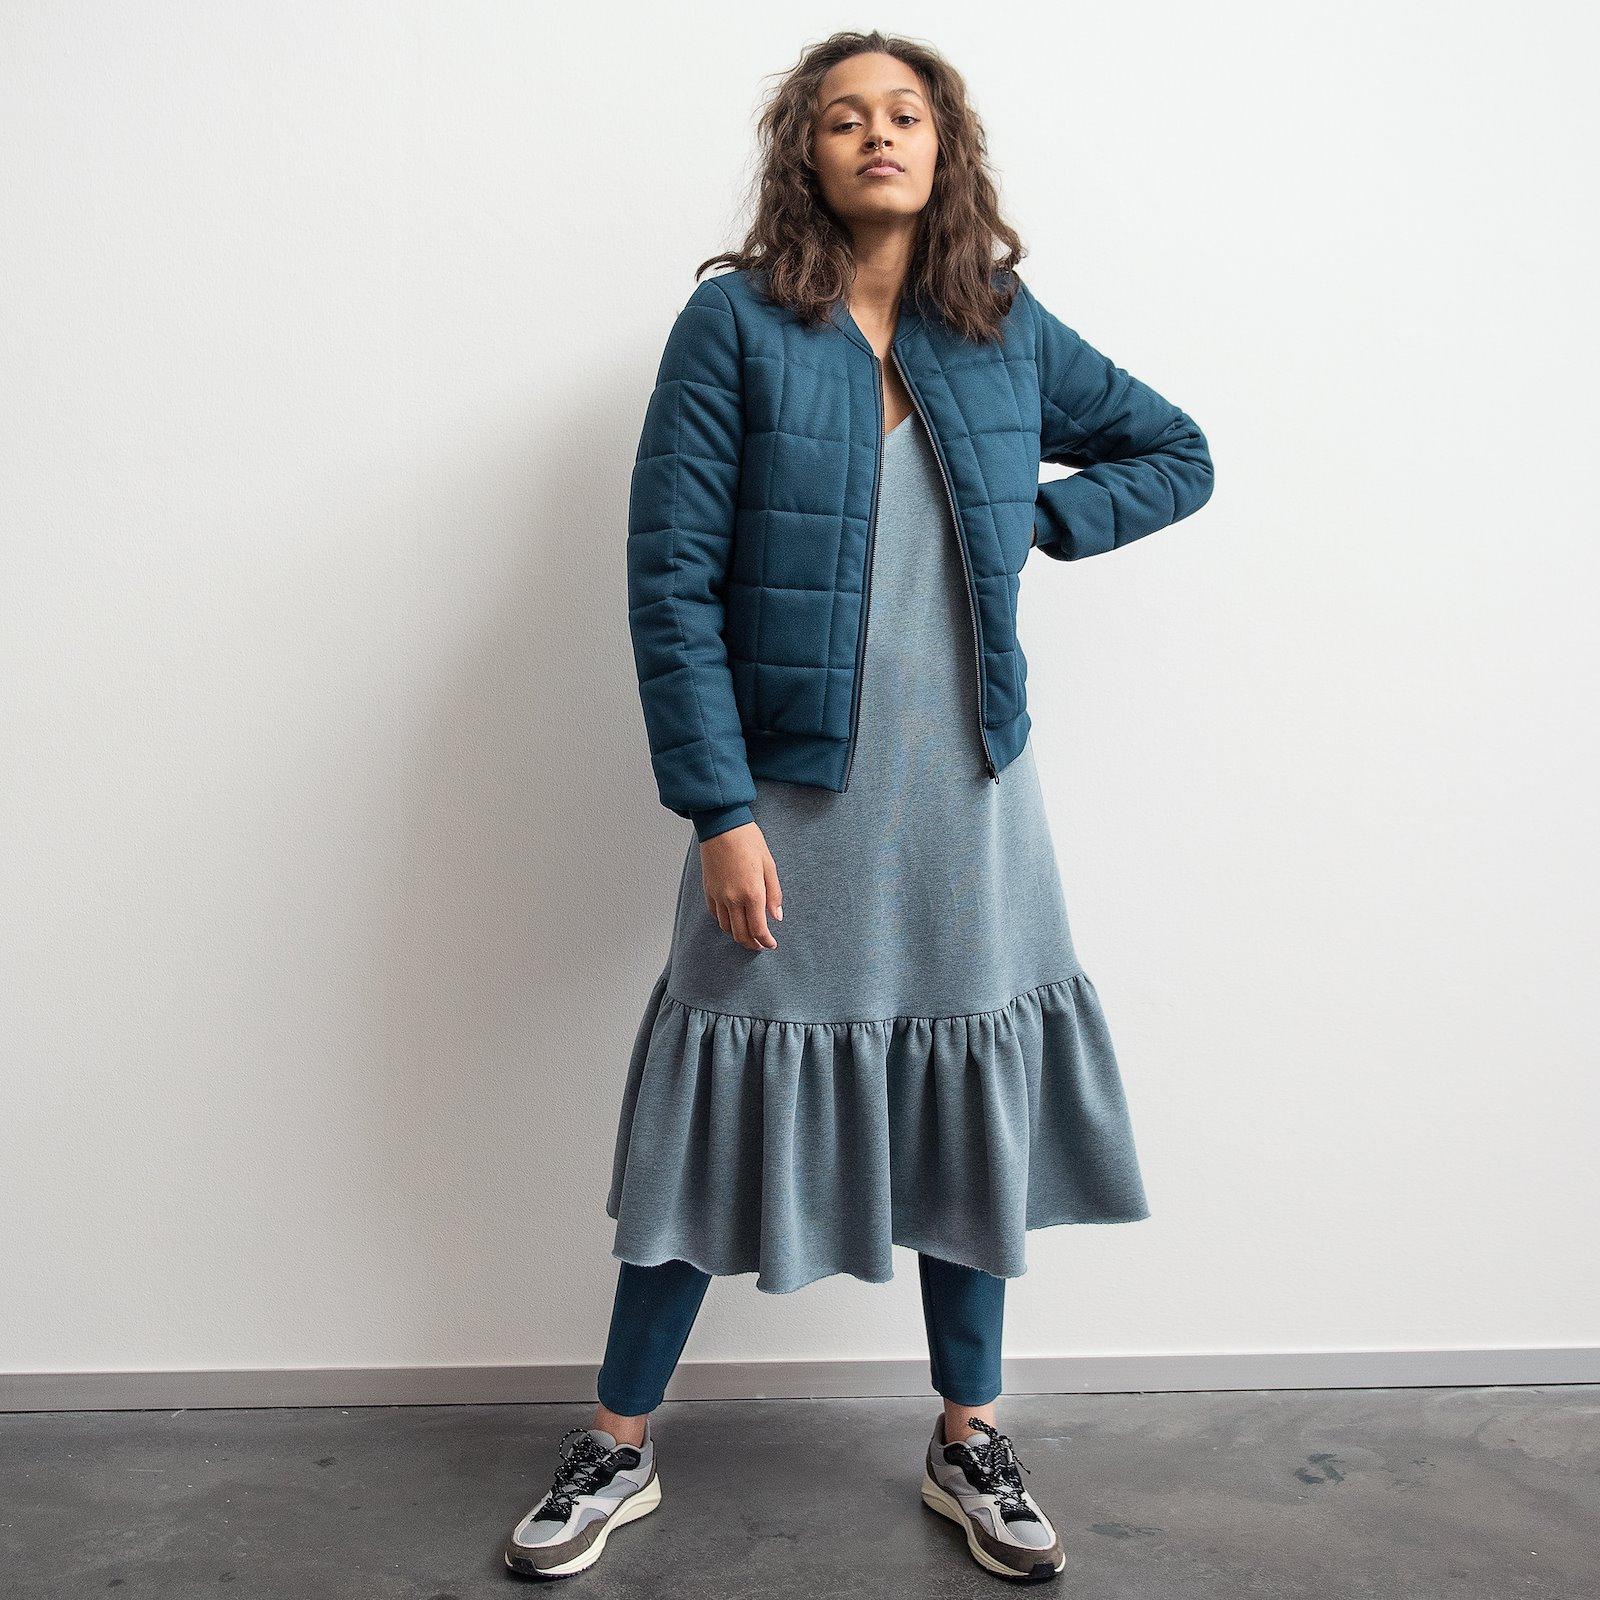 Strap dress and top, 44/16 p23146_211764_p24028_272795_9901_7029_p20050_272795_sskit